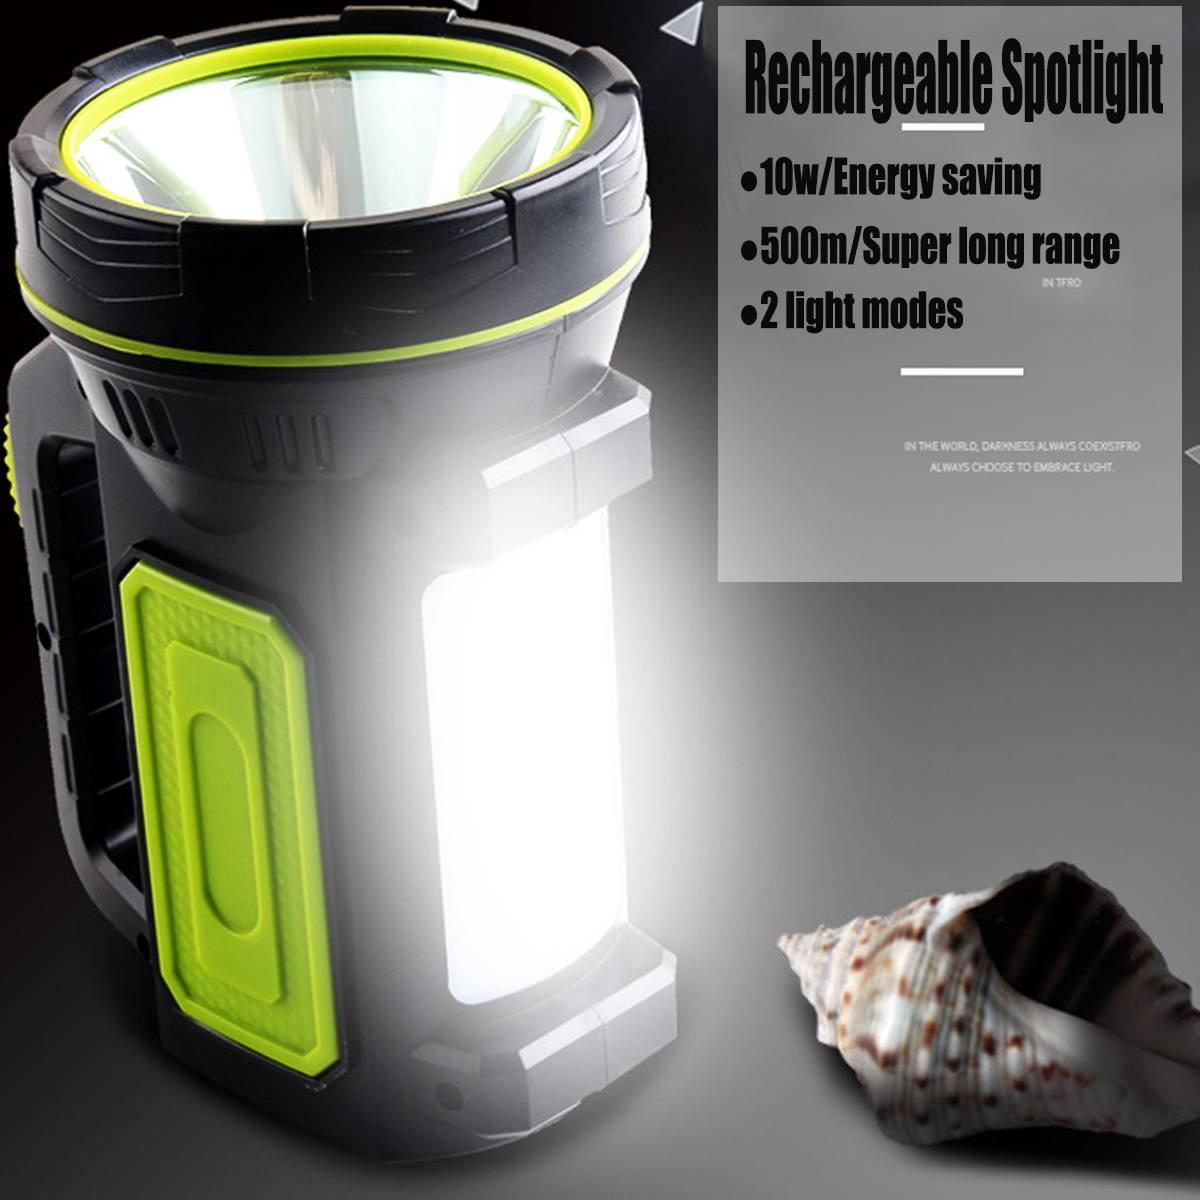 Outdoor Powerful Led Flashlight Rechargeable 10W EU/U.S. Regulations Portable Spot Flashlight Waterproof Handy Hand Flashlight